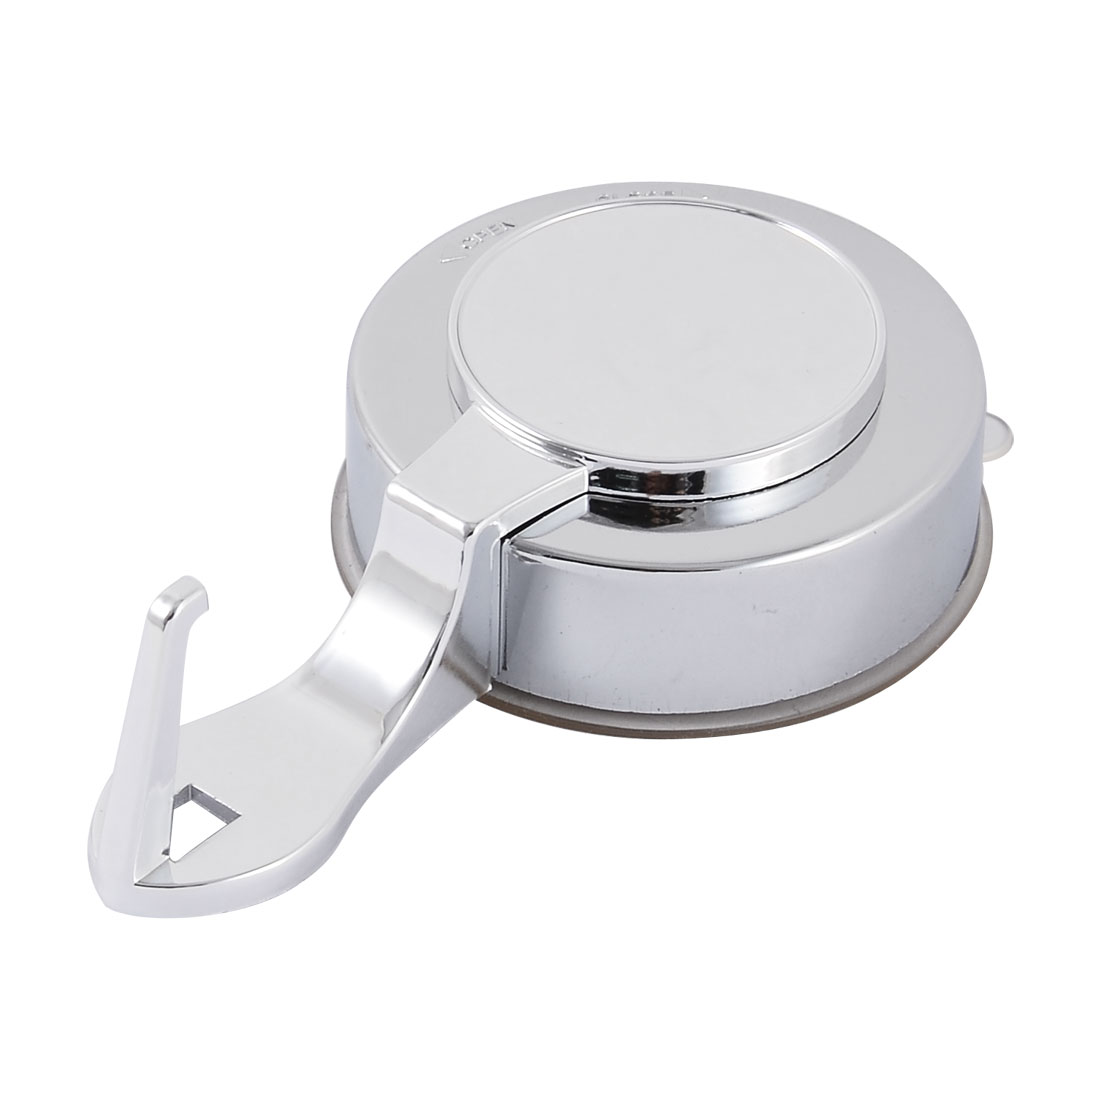 Unique Bargains Kitchen Household Plastic Lock Strong Suction Cup Single Hook Holder Hanger - image 1 of 3